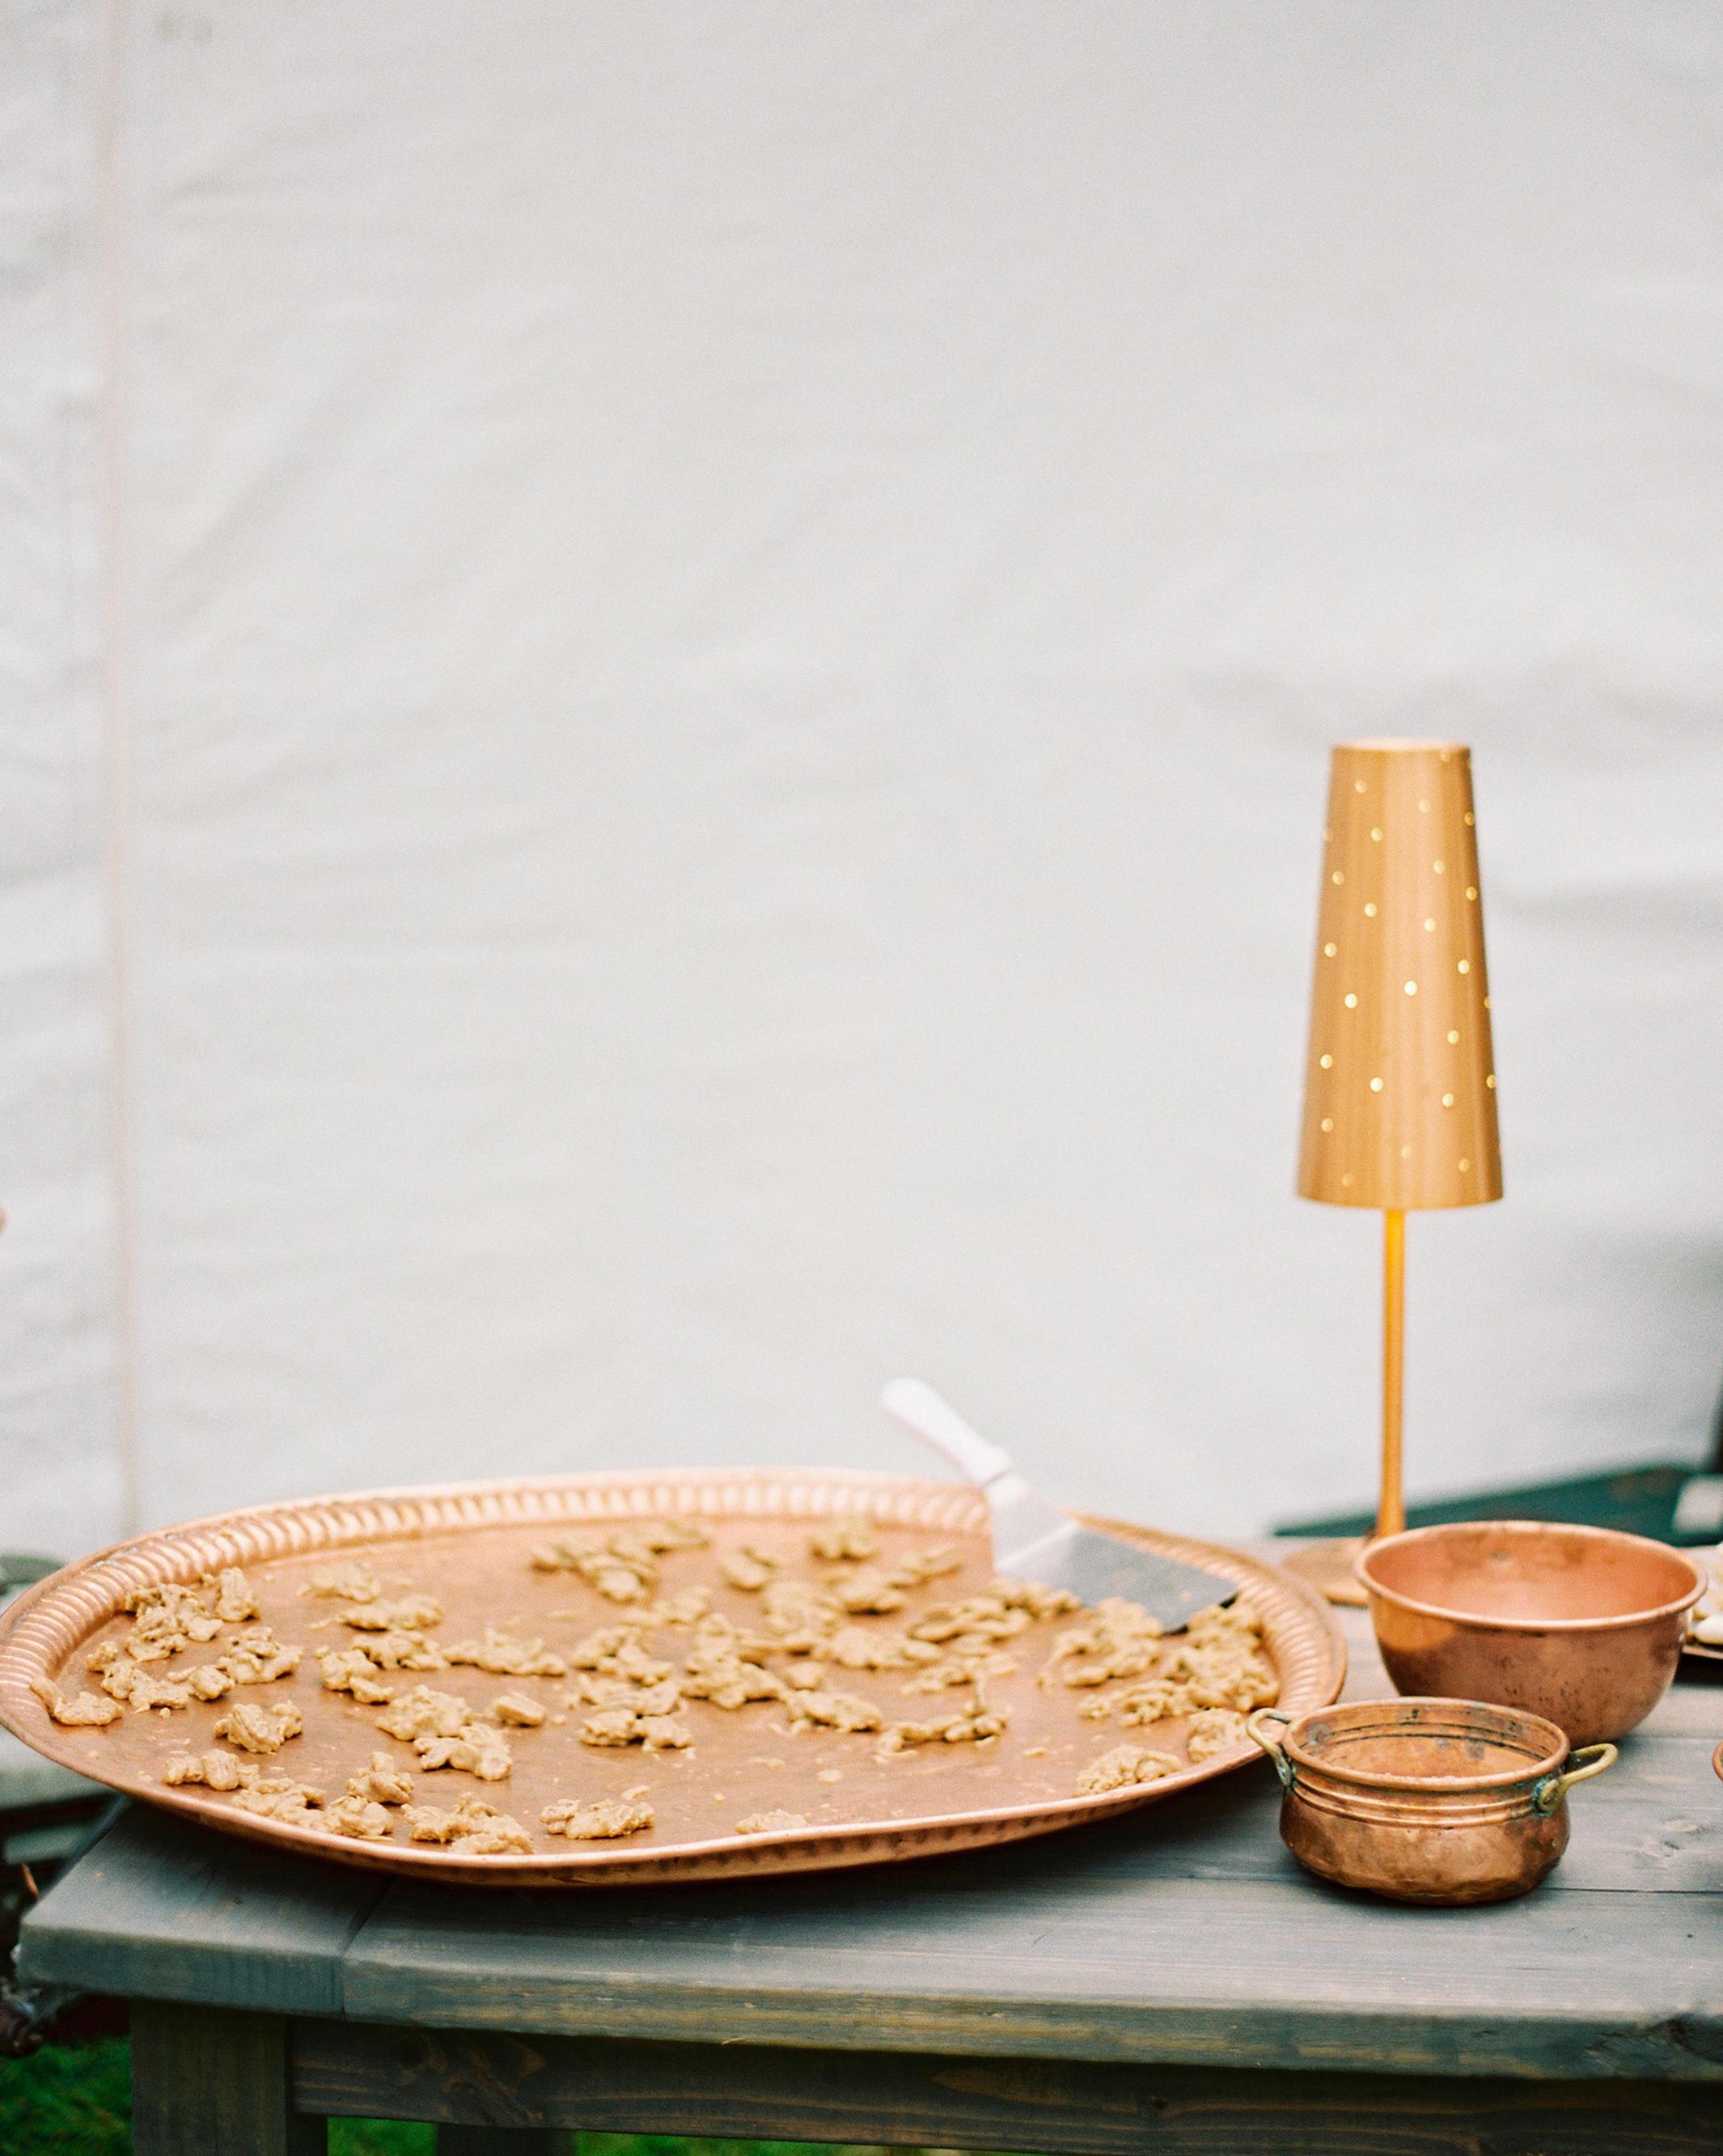 susan-cartter-wedding-pralines-008440012-s111503-0914.jpg